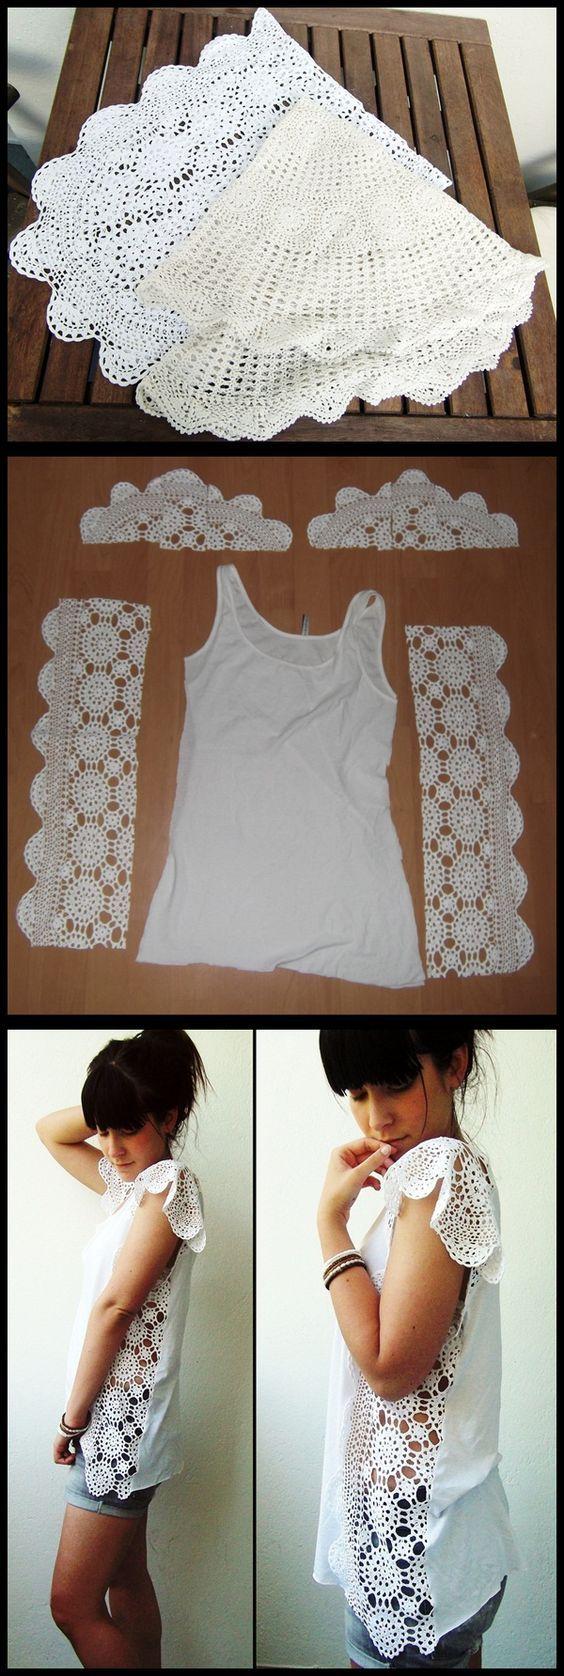 Crochet shirt as an exclusive wardrobe item 73